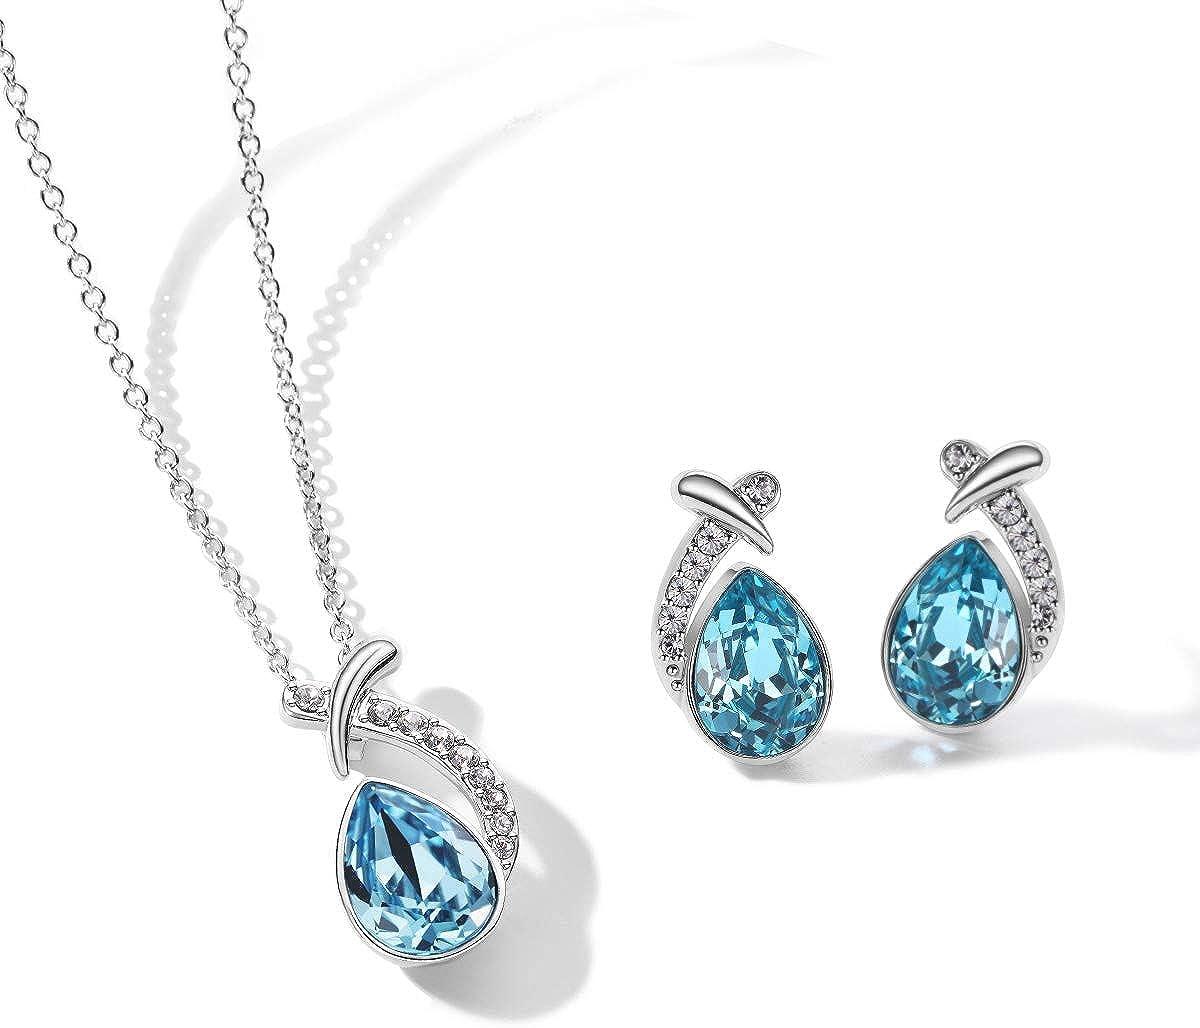 T400 Blue Waterdrop Crystal Pendant Necklace & Stud Earrings Jewelry Set Birthday Gift for Women Girls